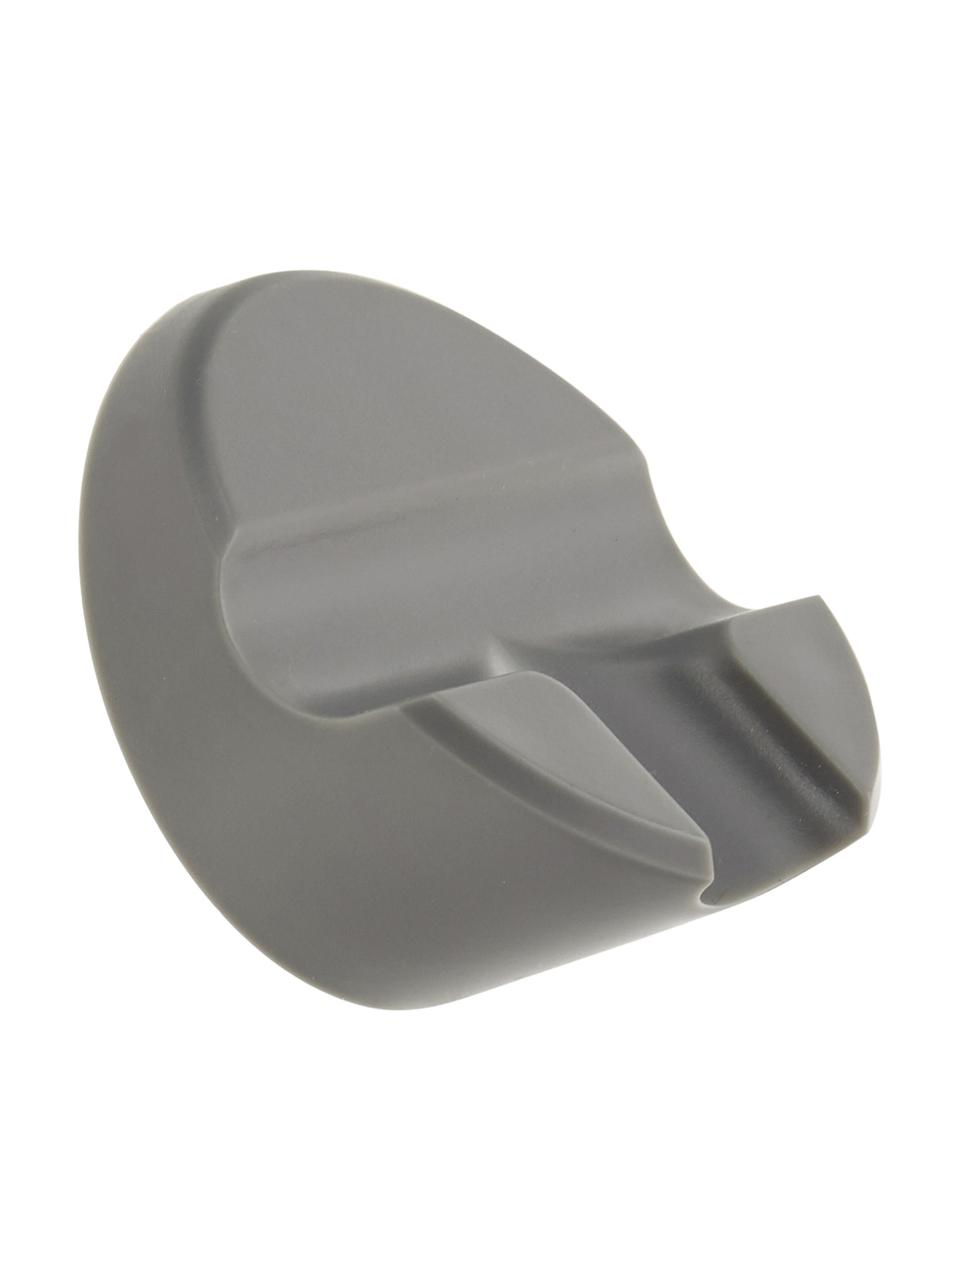 Raamwisserset Shiba, 2-delig, Raamwisser: kunststof (ABS), Rand: siliconen, Grijs, 21 x 5 cm